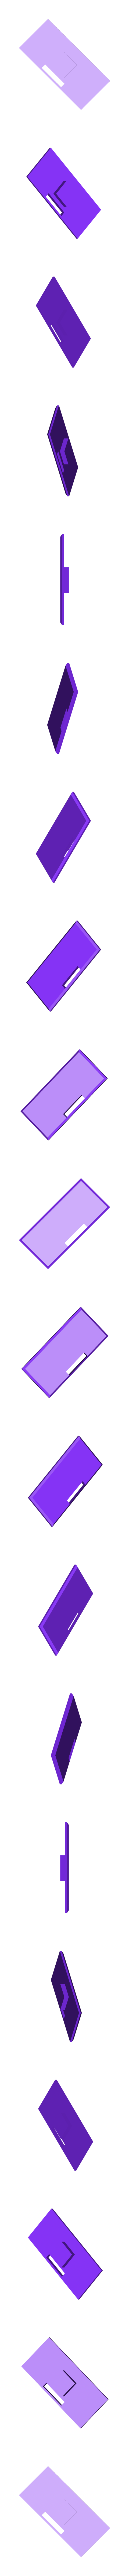 Light_Platform_Support_and_Tower_Top.stl Download free STL file HO Scale 68' Yard Light Tower • 3D printer model, kabrumble